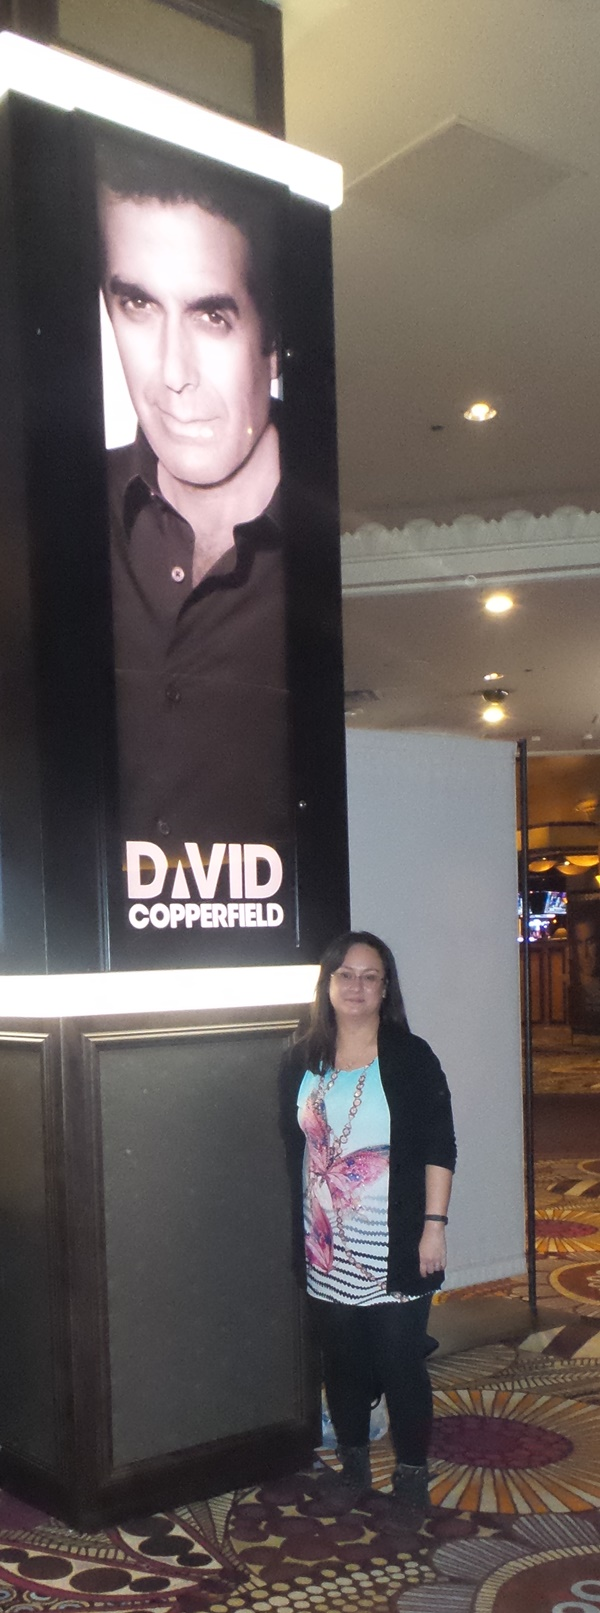 david copperfield sign inside pbm